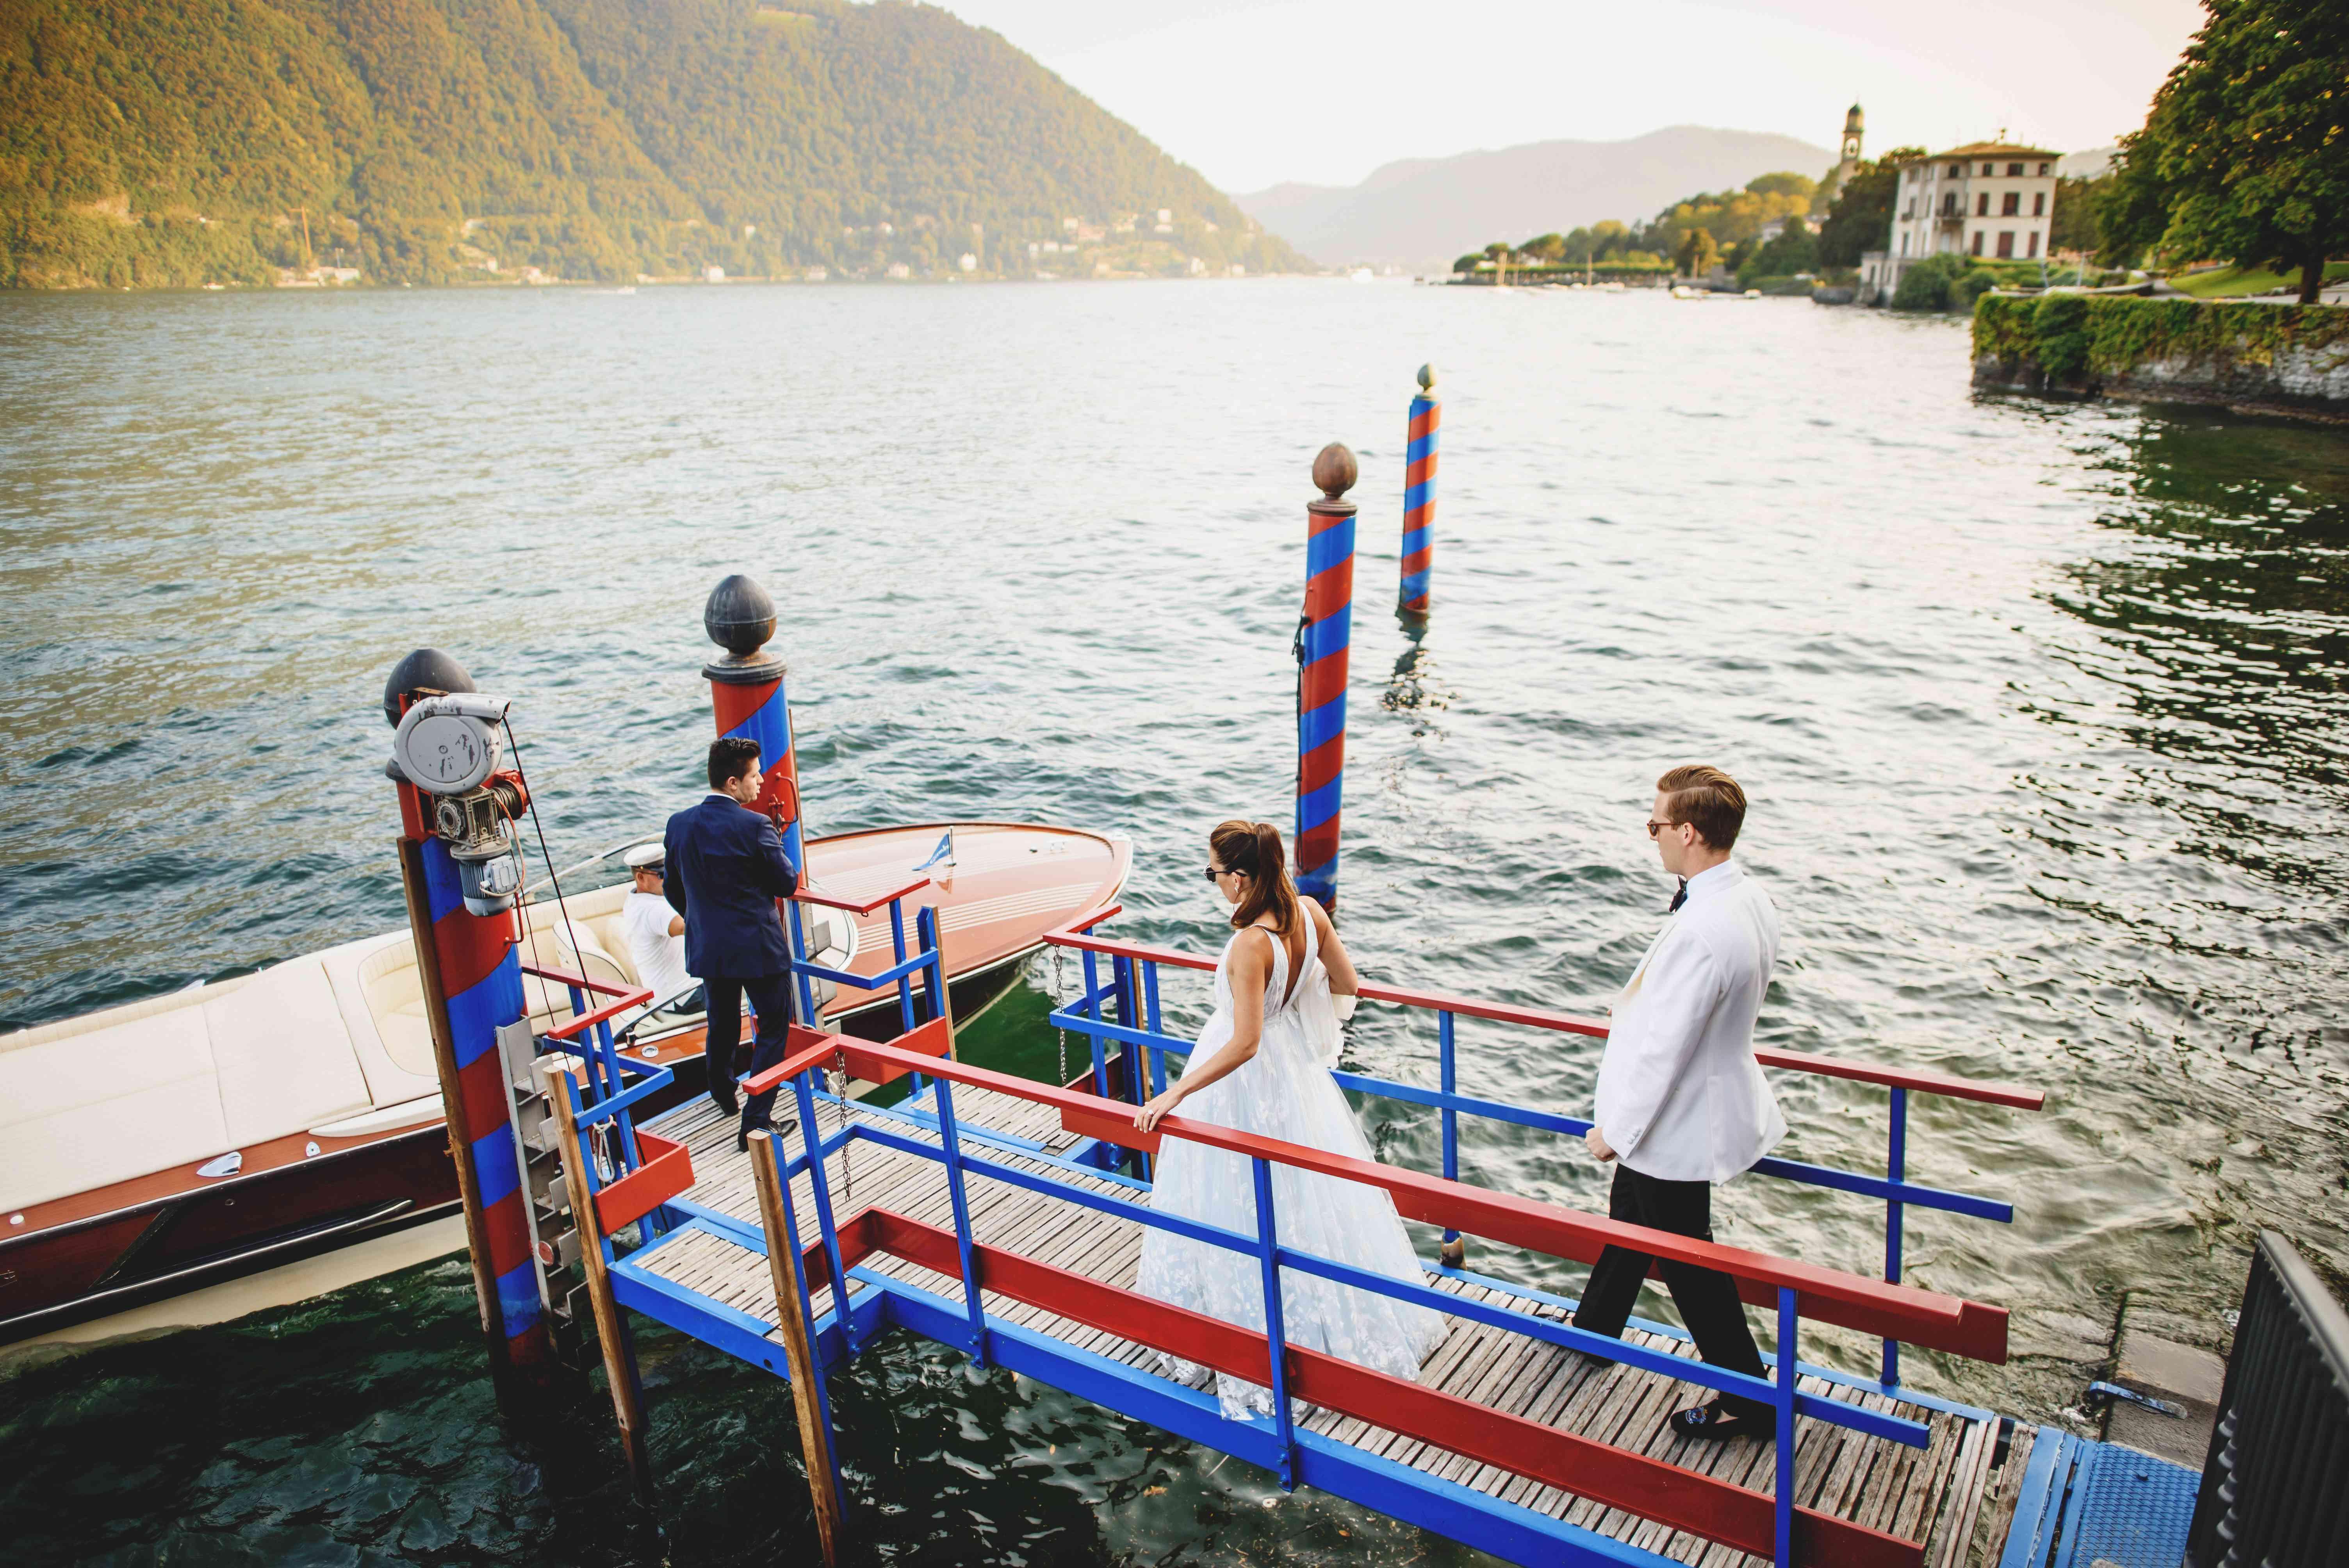 bride and groom boat transportation